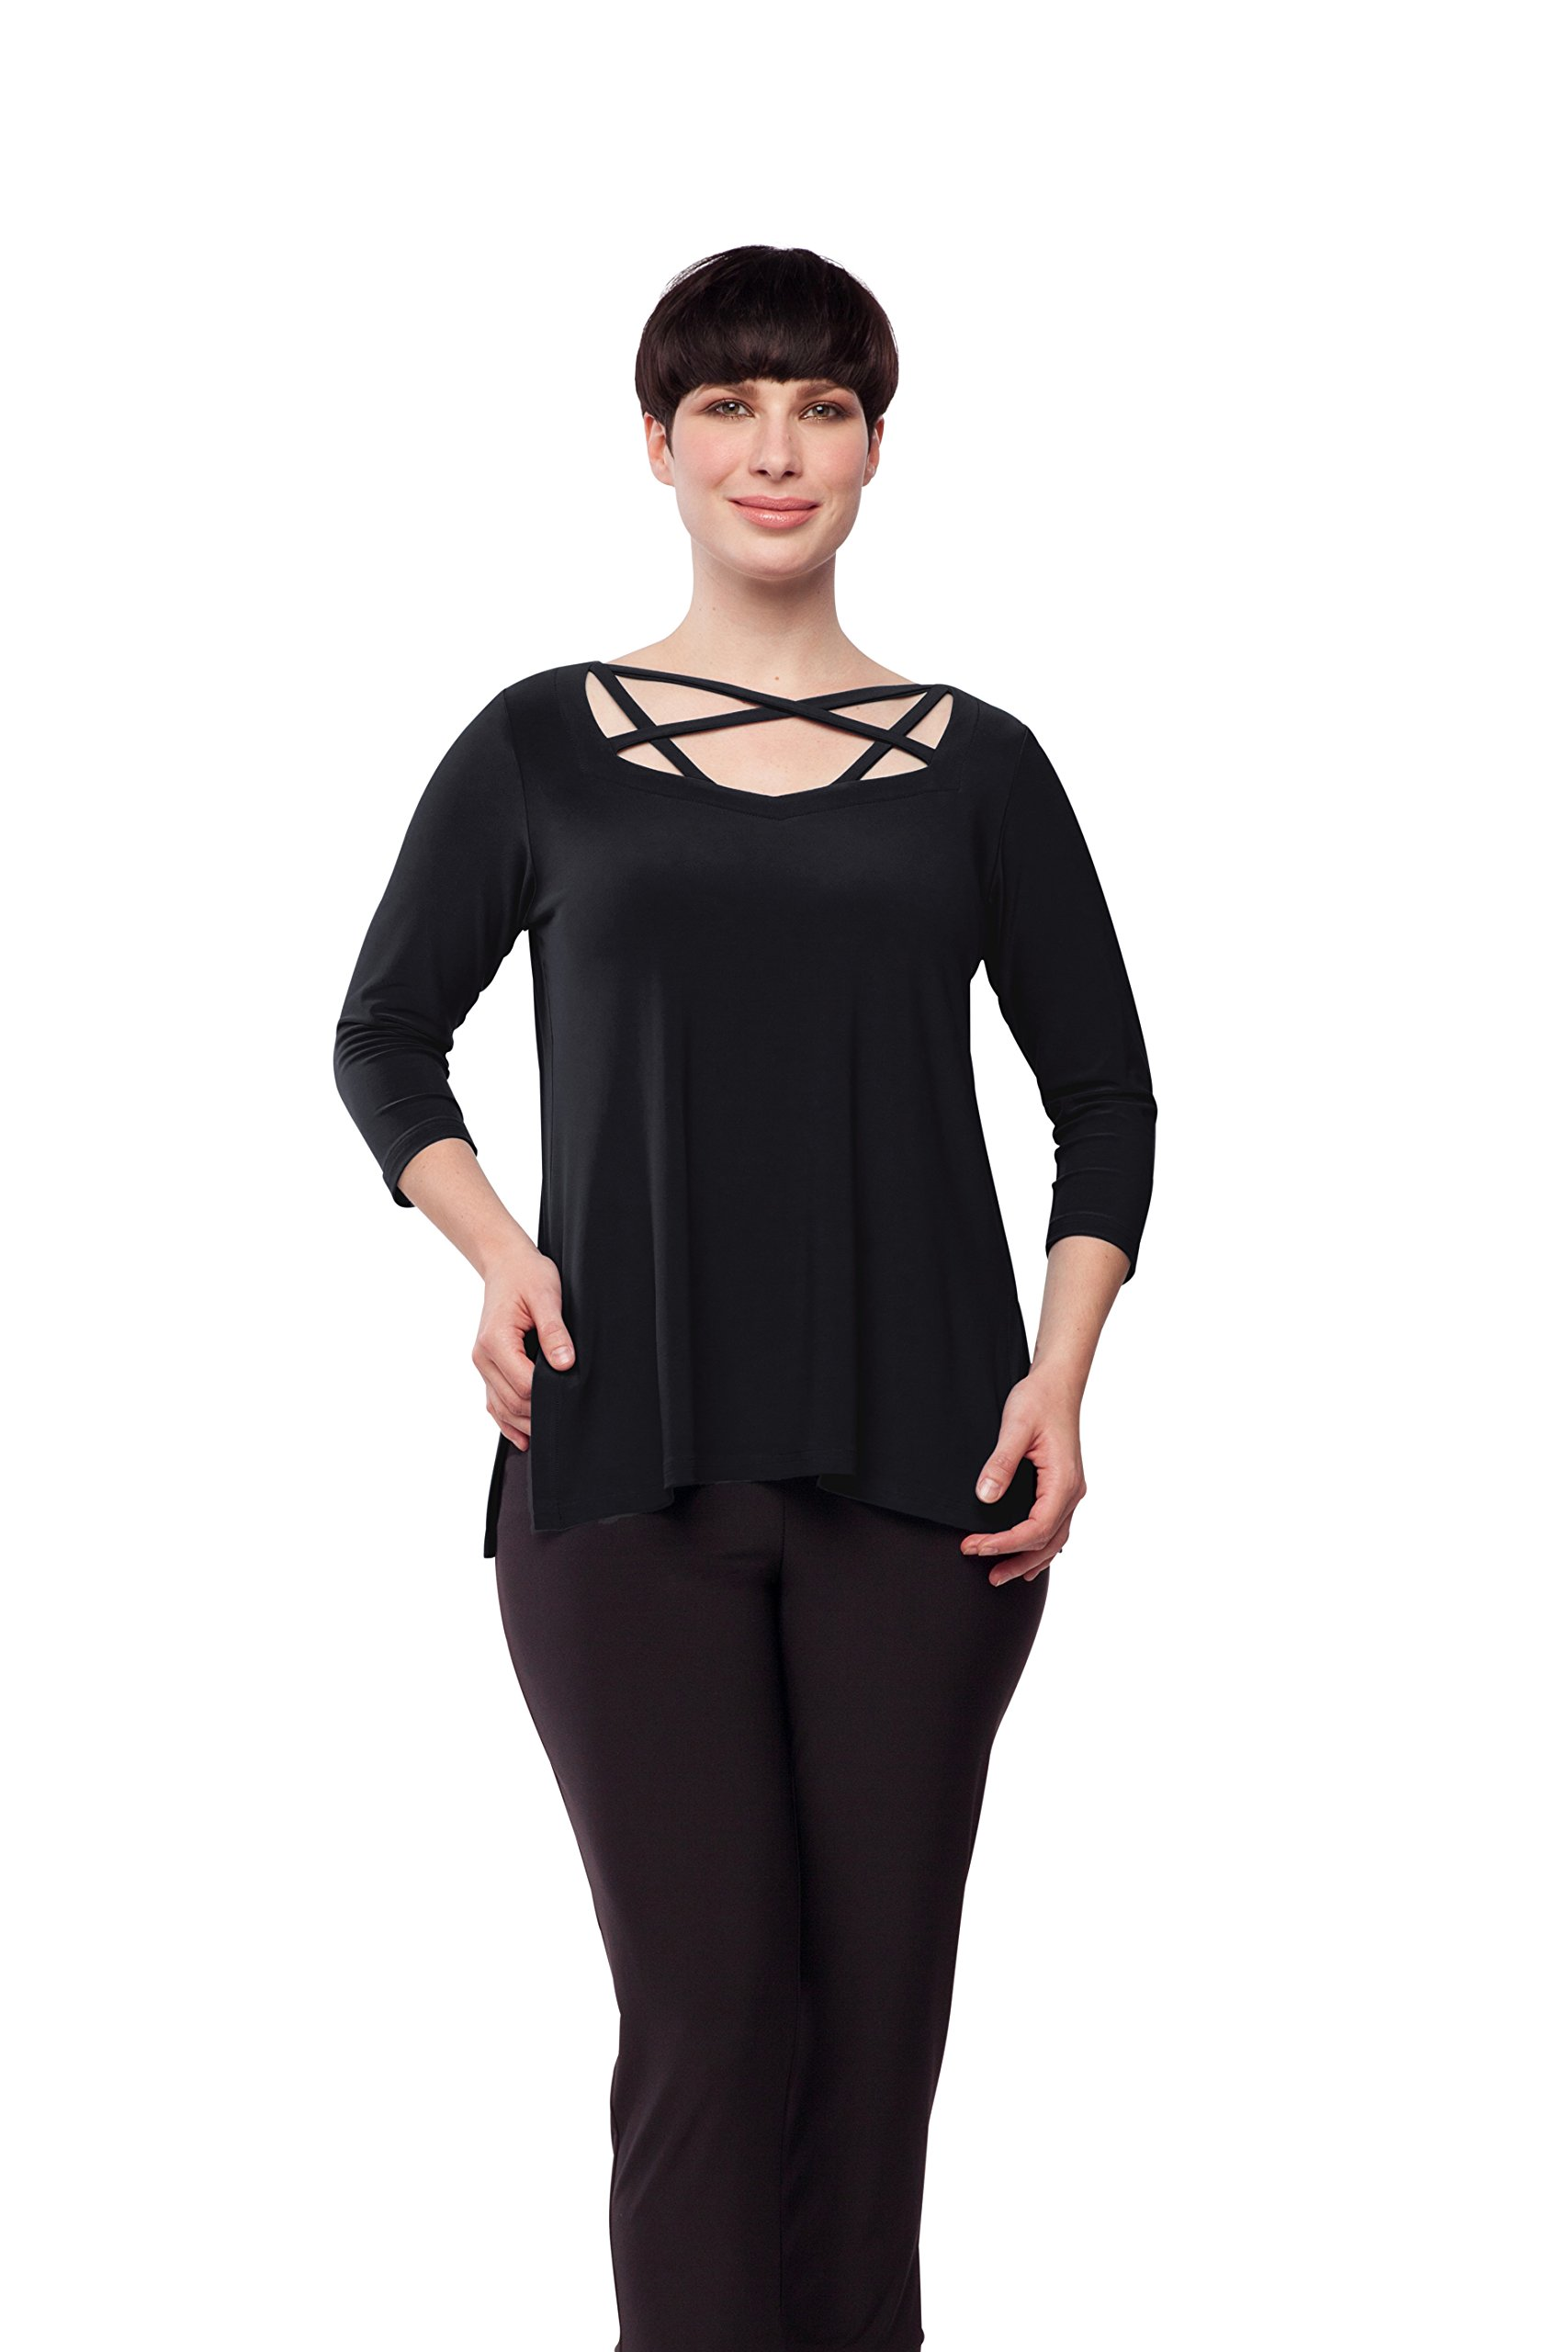 Sympli Women's Zig Zag Top-Black (10-3Q Sleeve, Black)